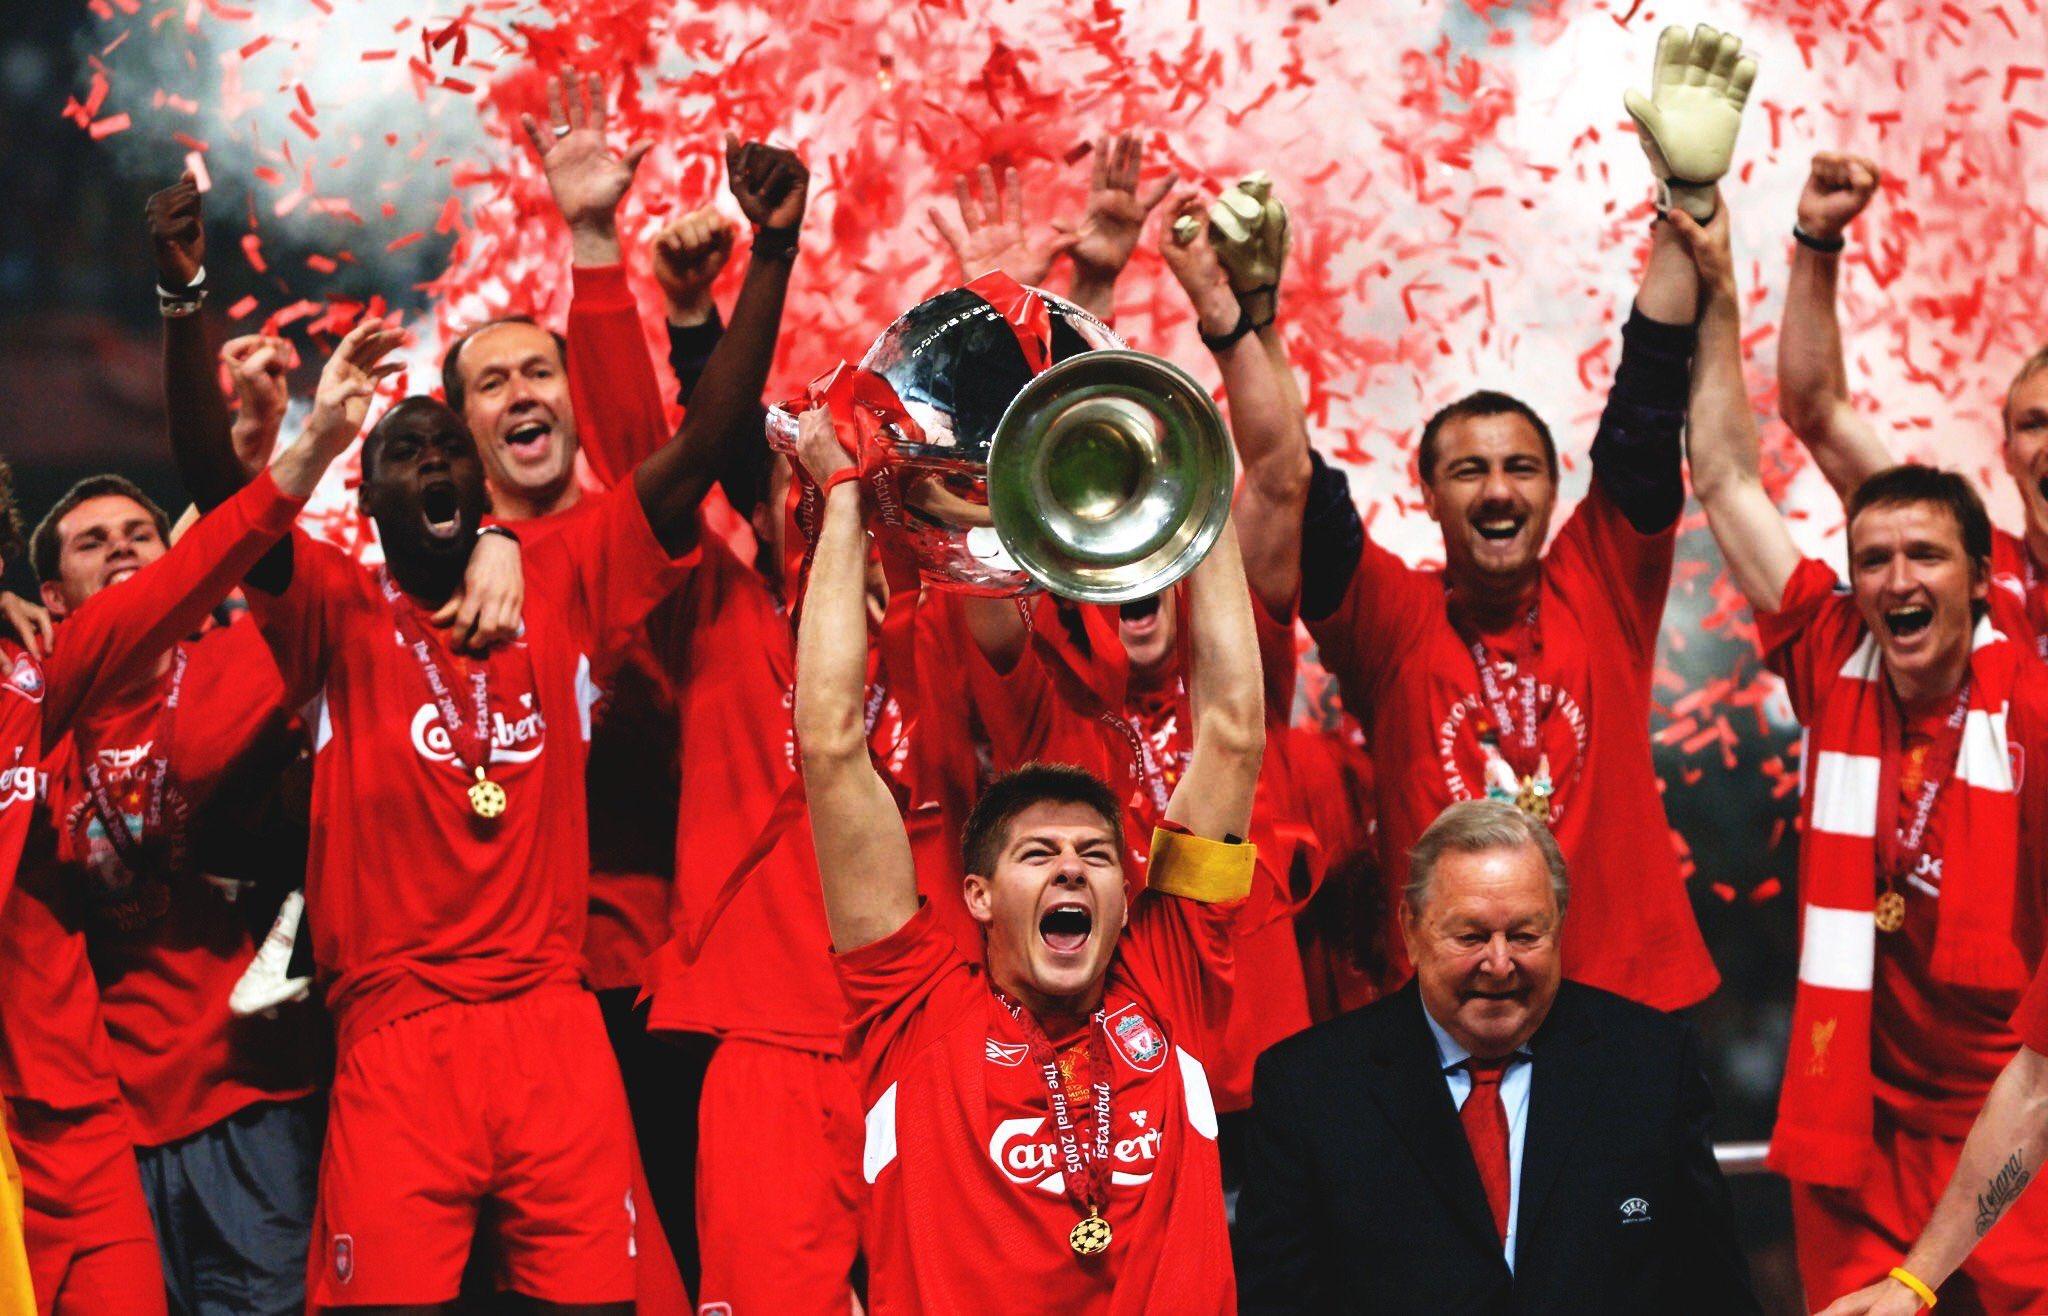 The best there is, the best there was, the best there ever will be  Happy birthday Steven Gerrard!